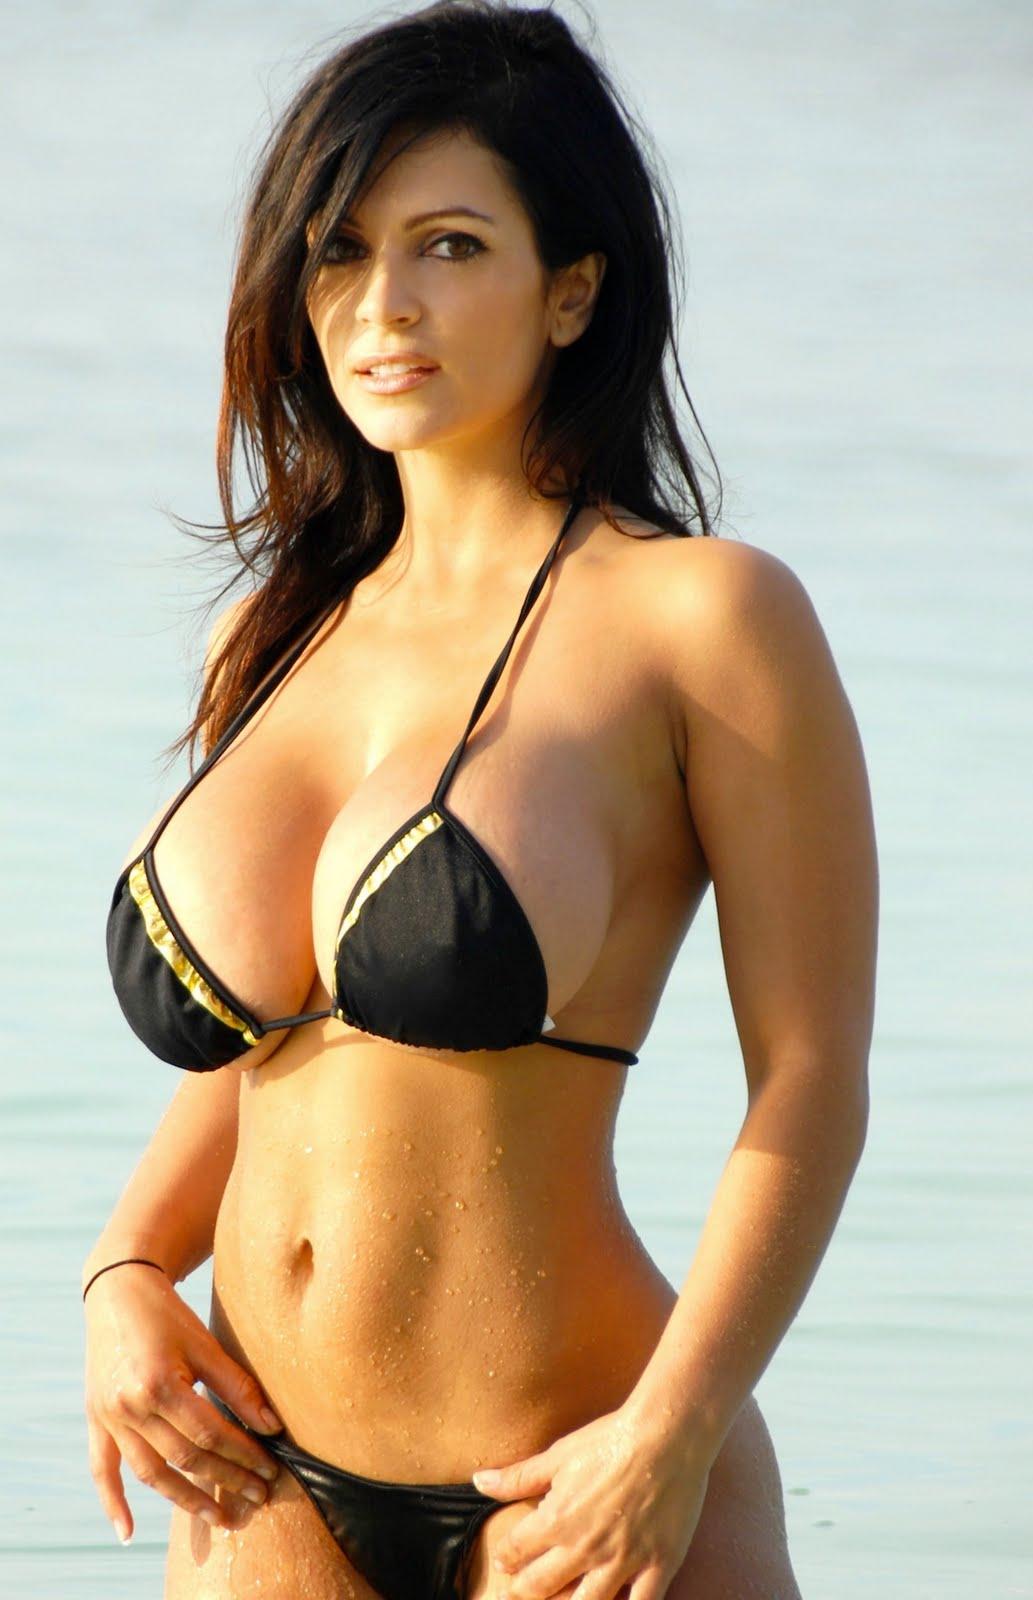 Bikini babes boobs pics